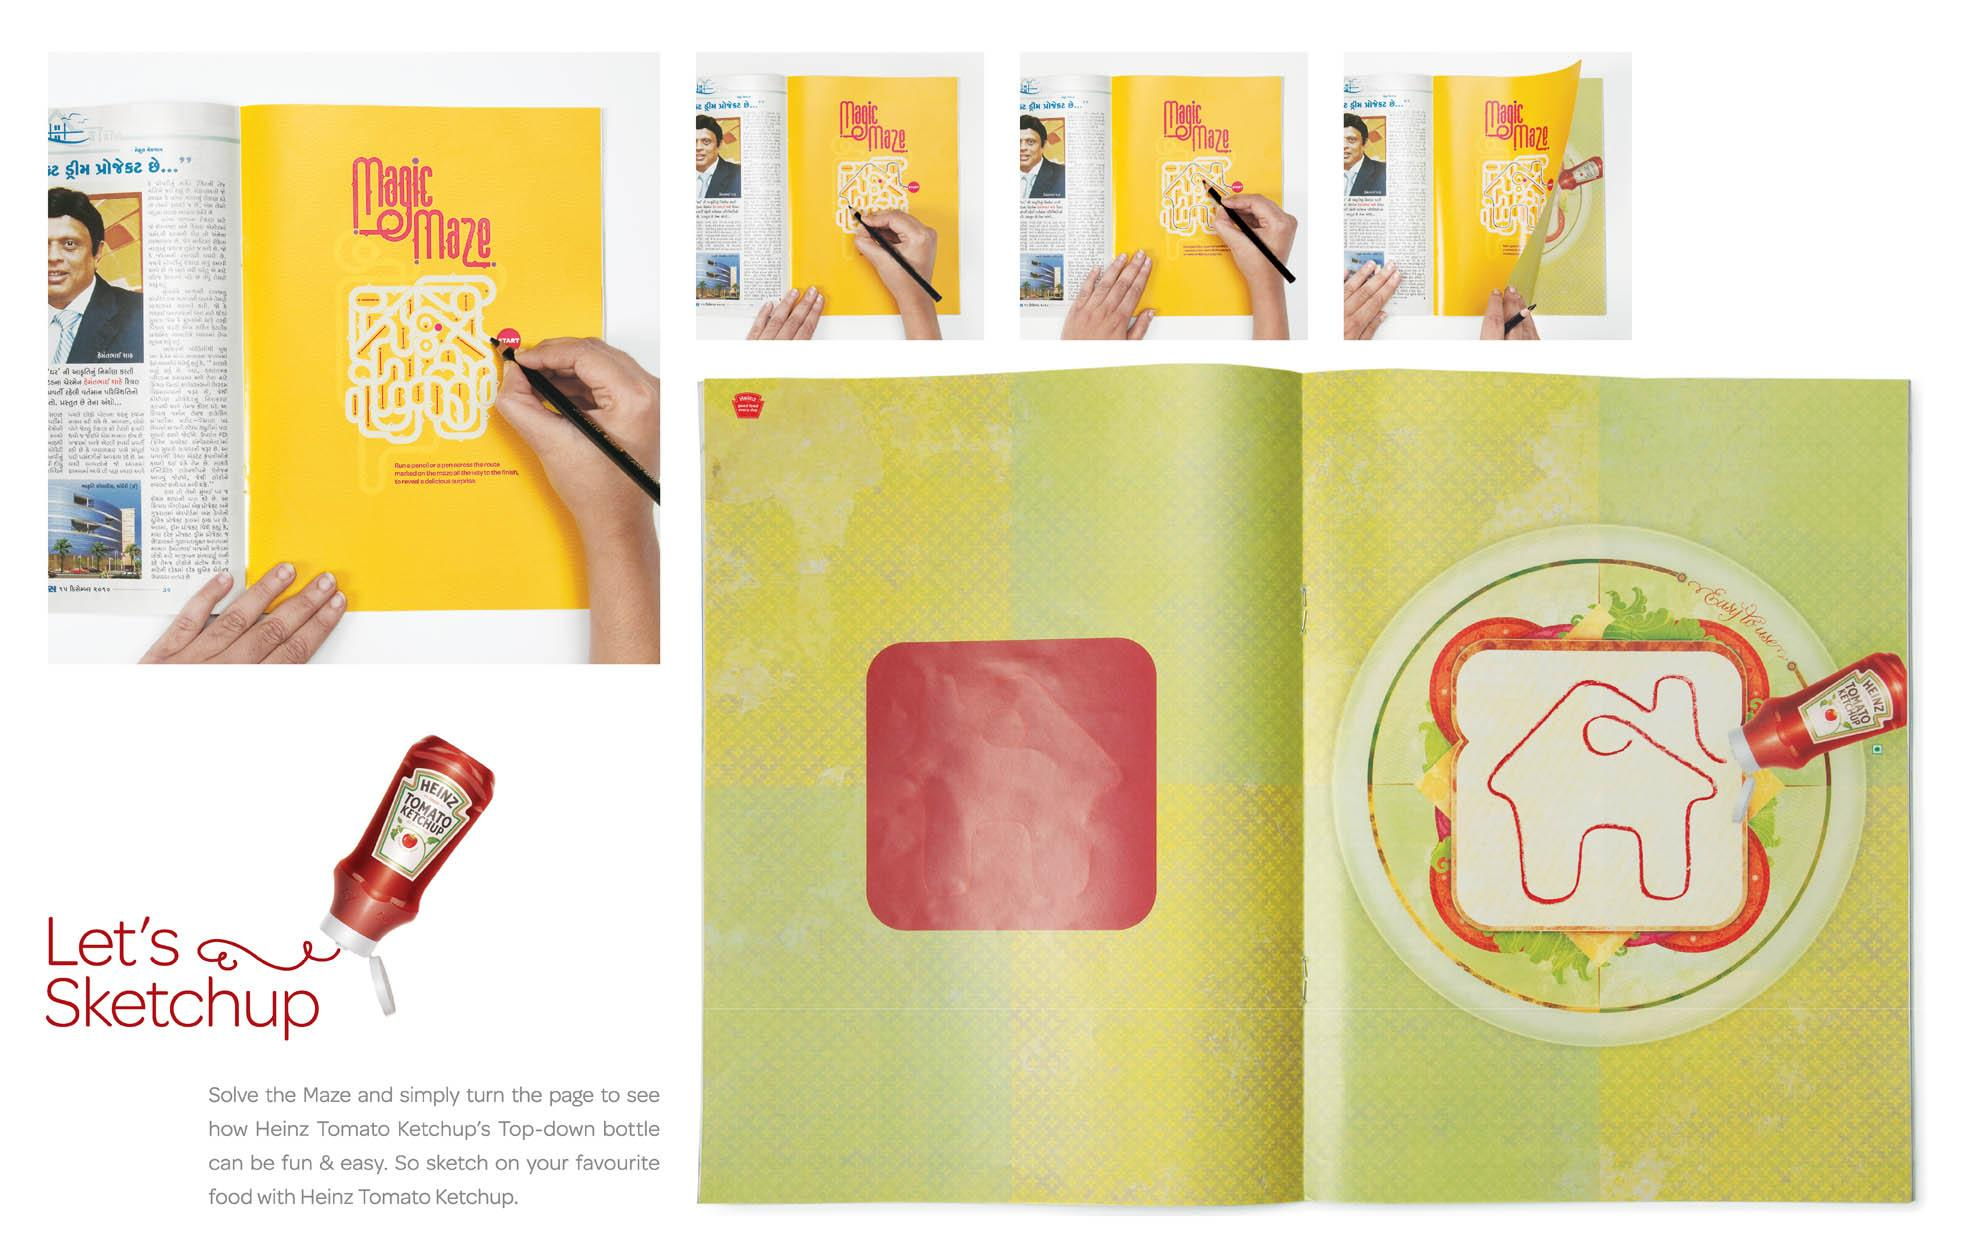 Heinz Print Ad -  Heinz Sketch up, 2